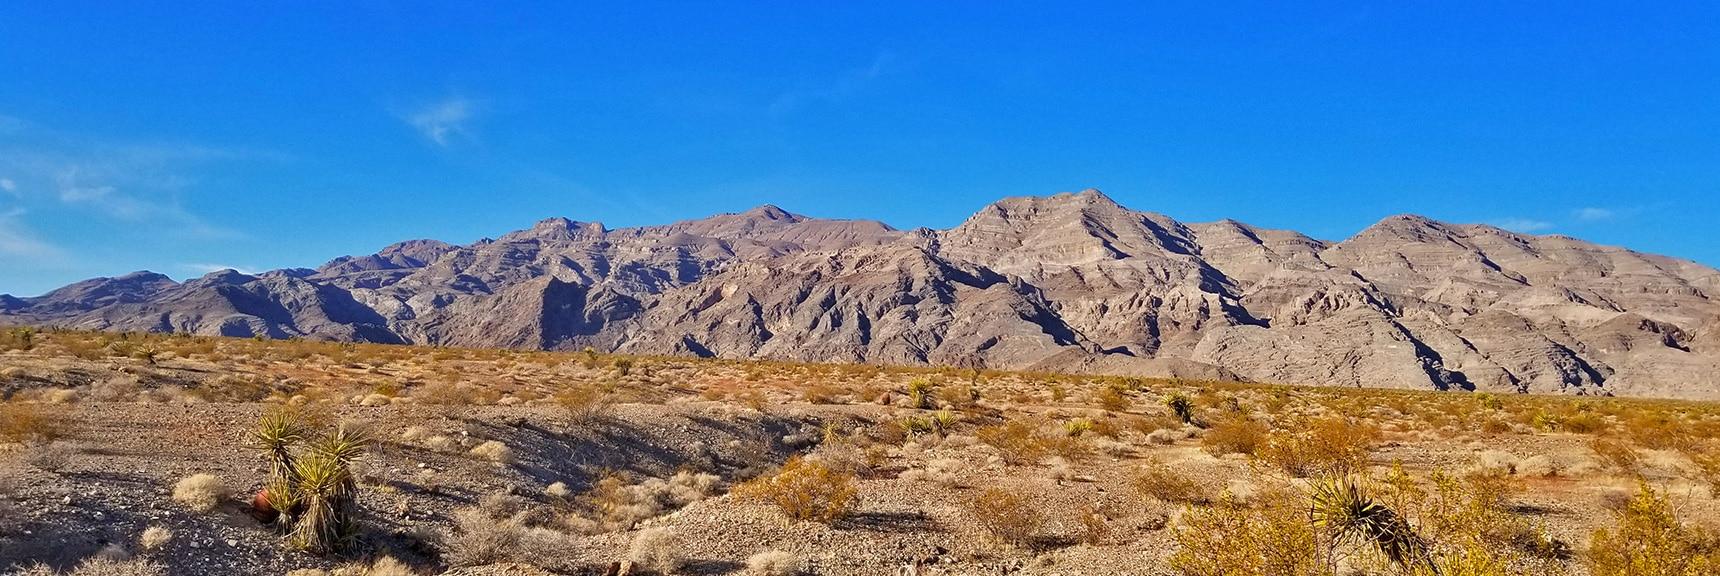 Gass Peak Viewed from Base of Pass at Power Lines | Gass Peak Road Circuit | Desert National Wildlife Refuge | Nevada